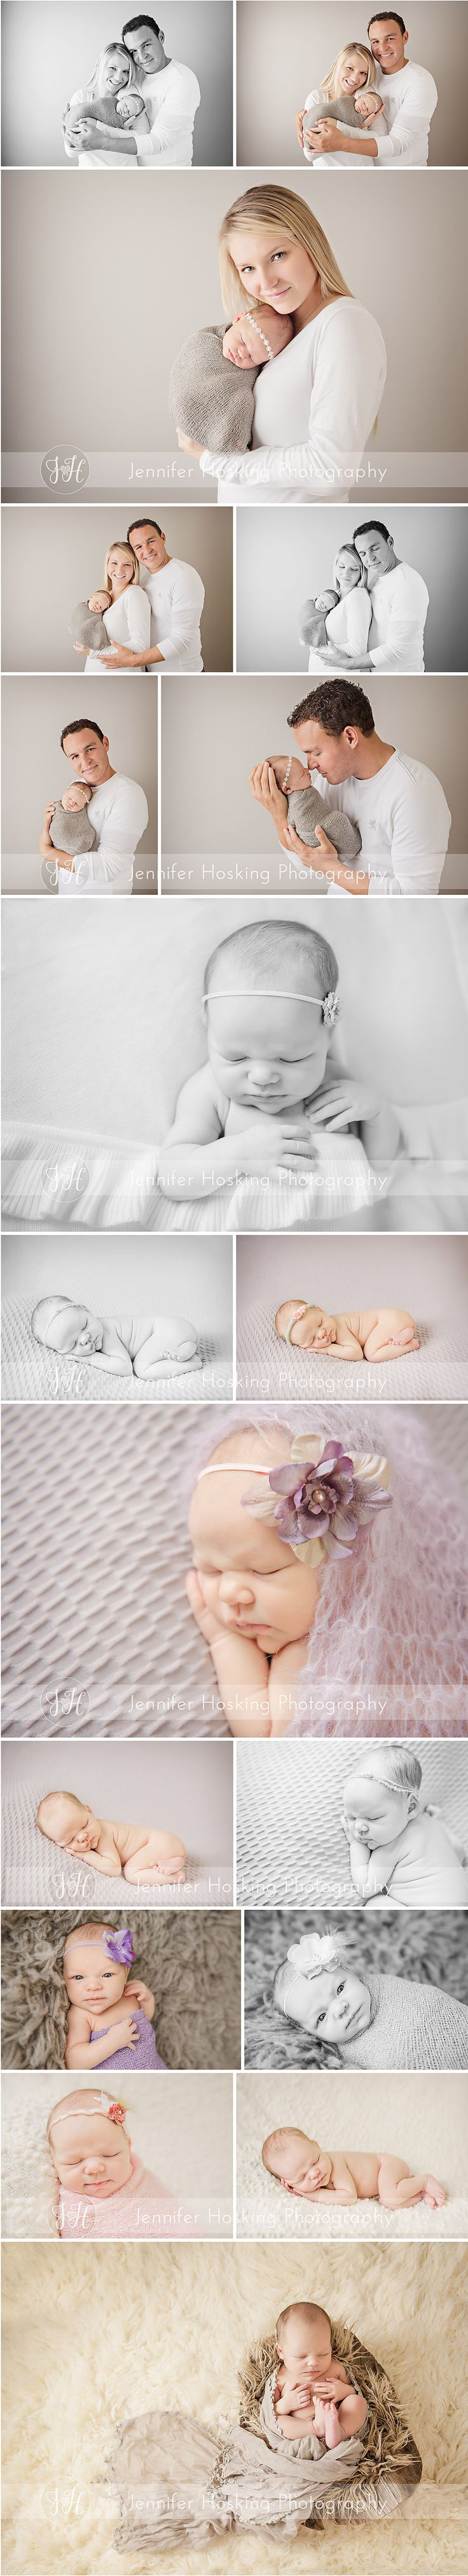 Newborn Photographer Metro Detroit